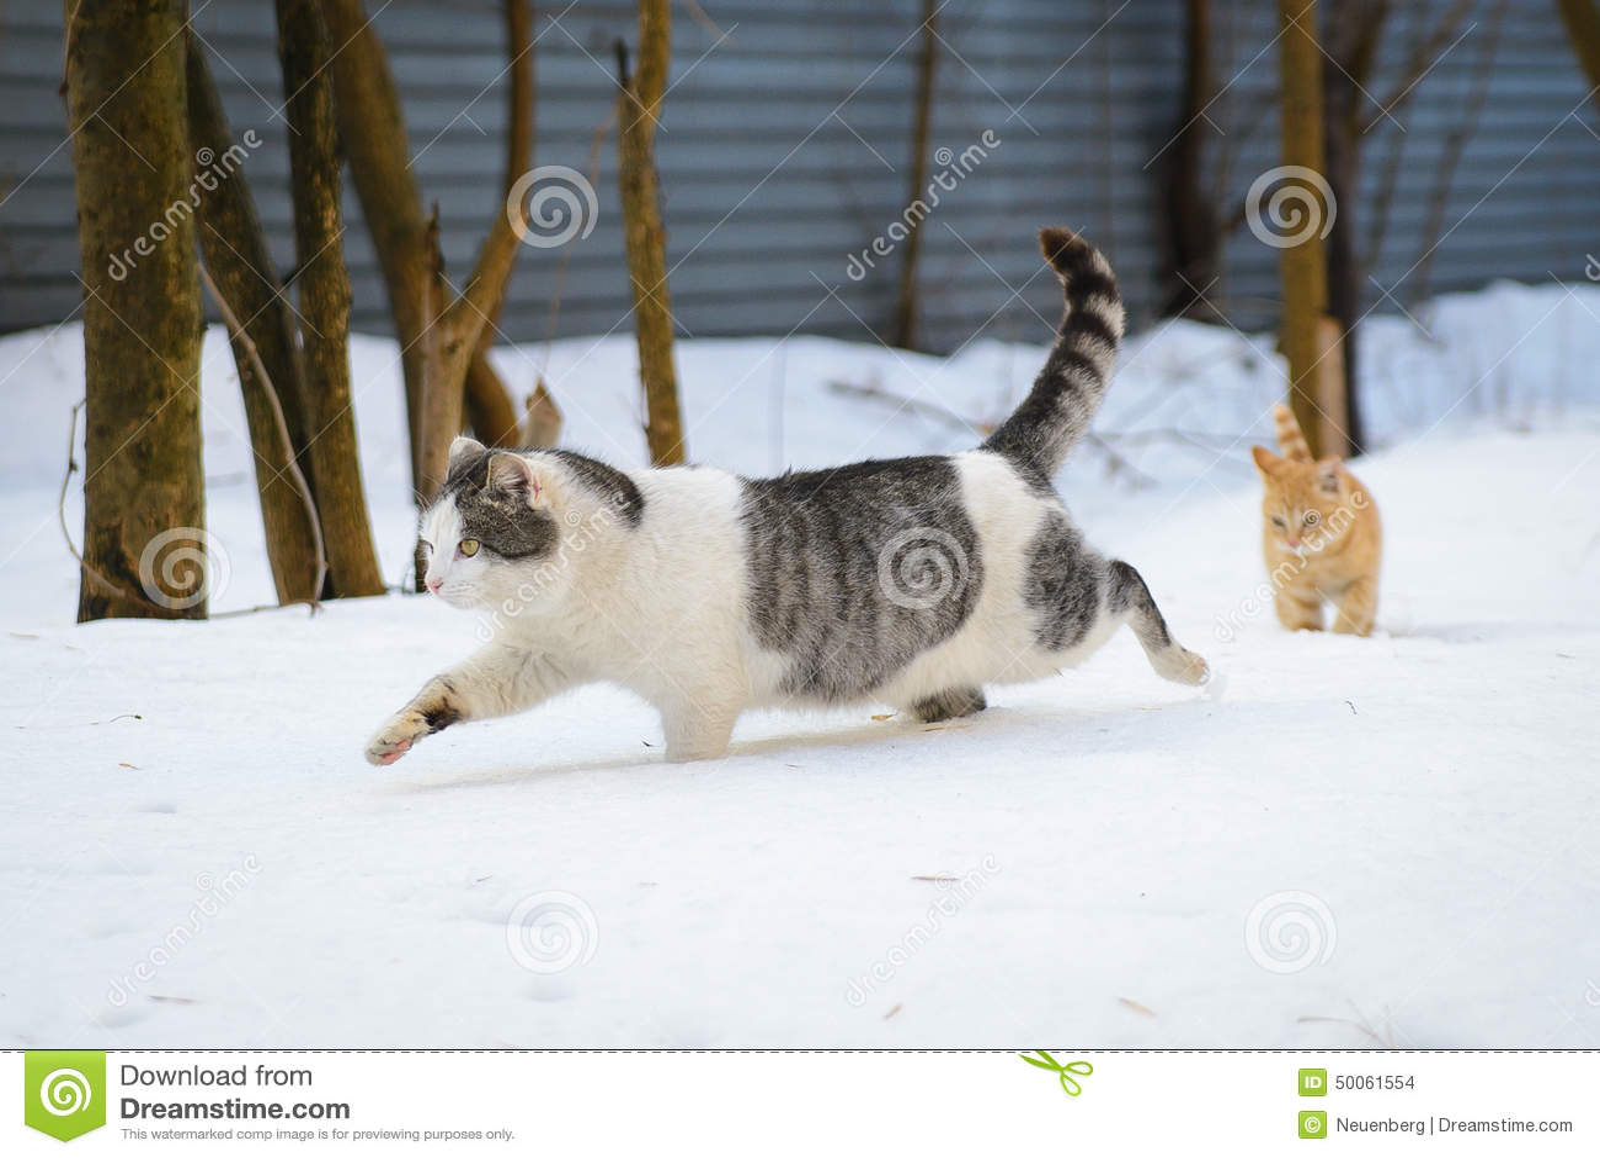 Chat et Kitten Running dans la neige